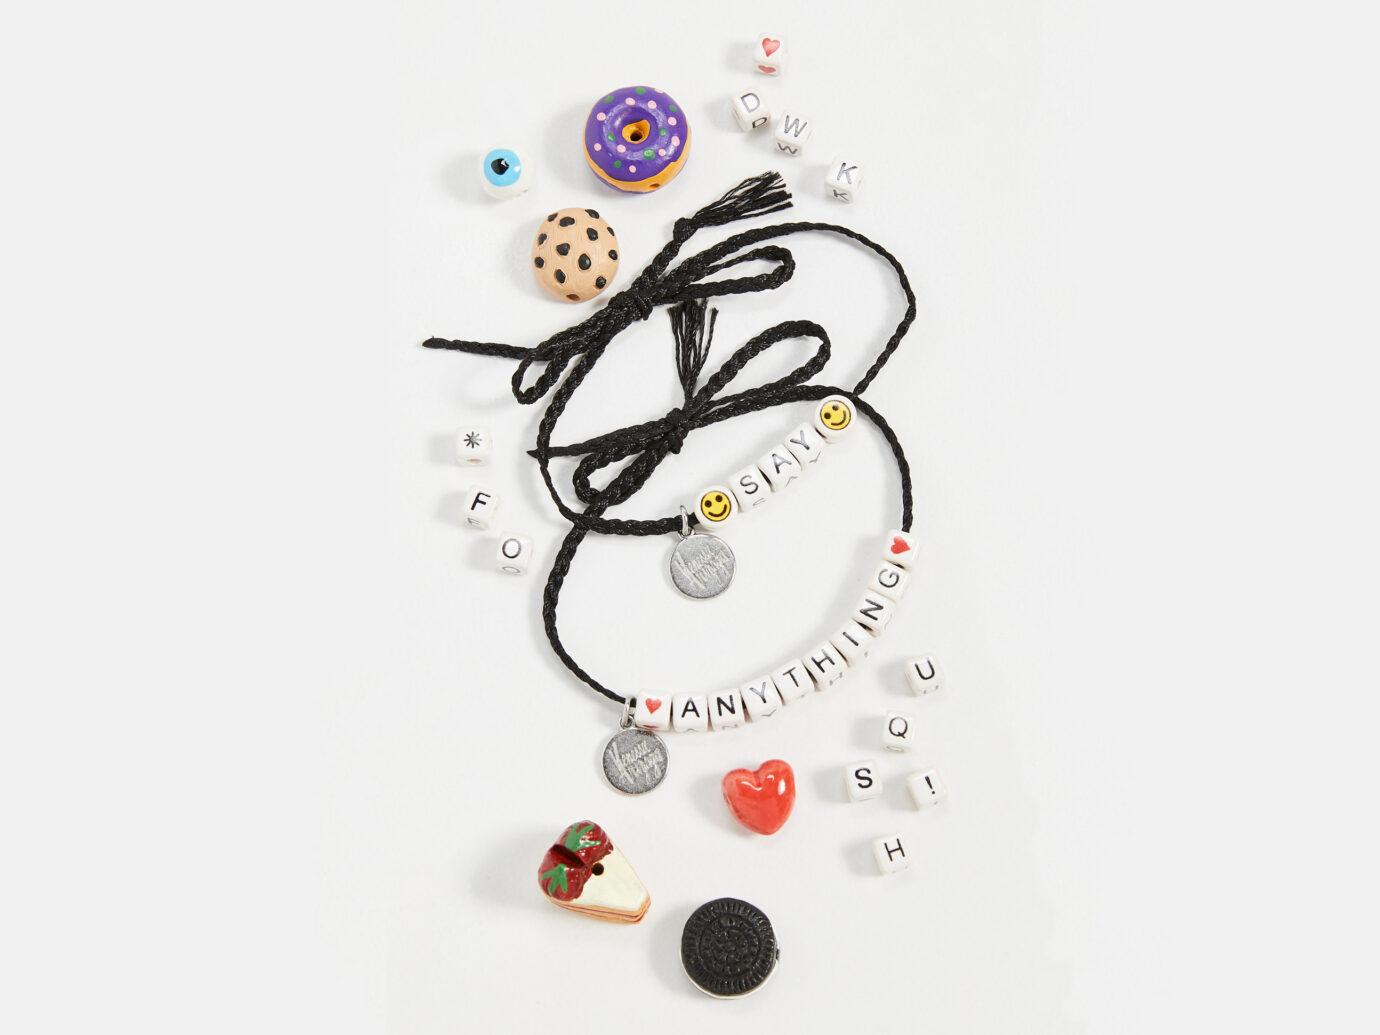 Venessa Arizaga Say Anything DIY Bracelet Kit